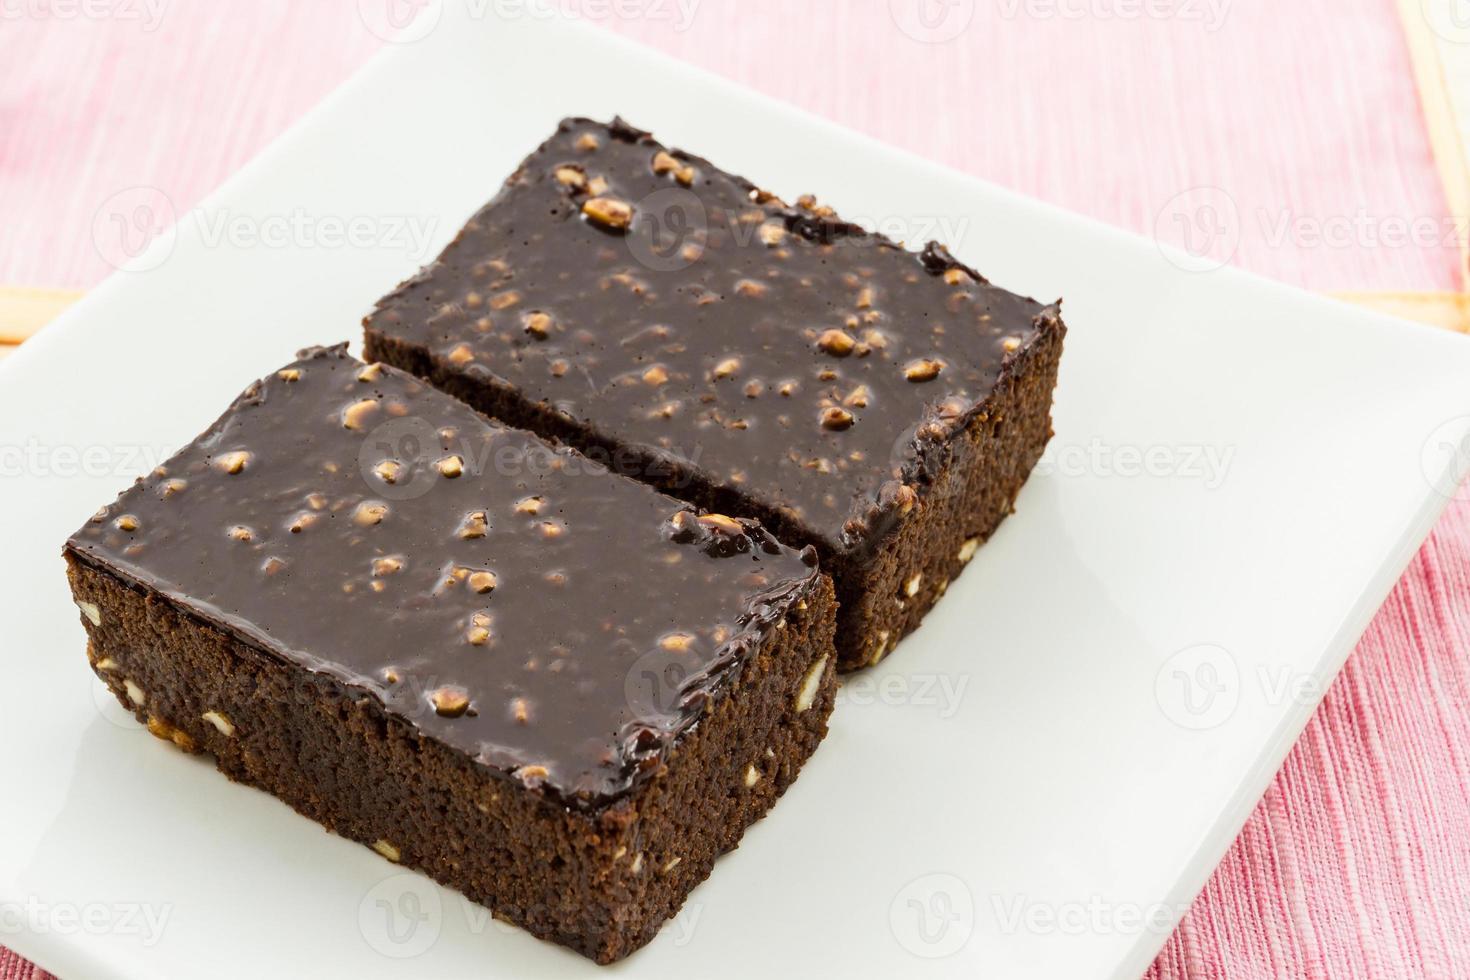 gâteau au brownie sur fond blanc. photo